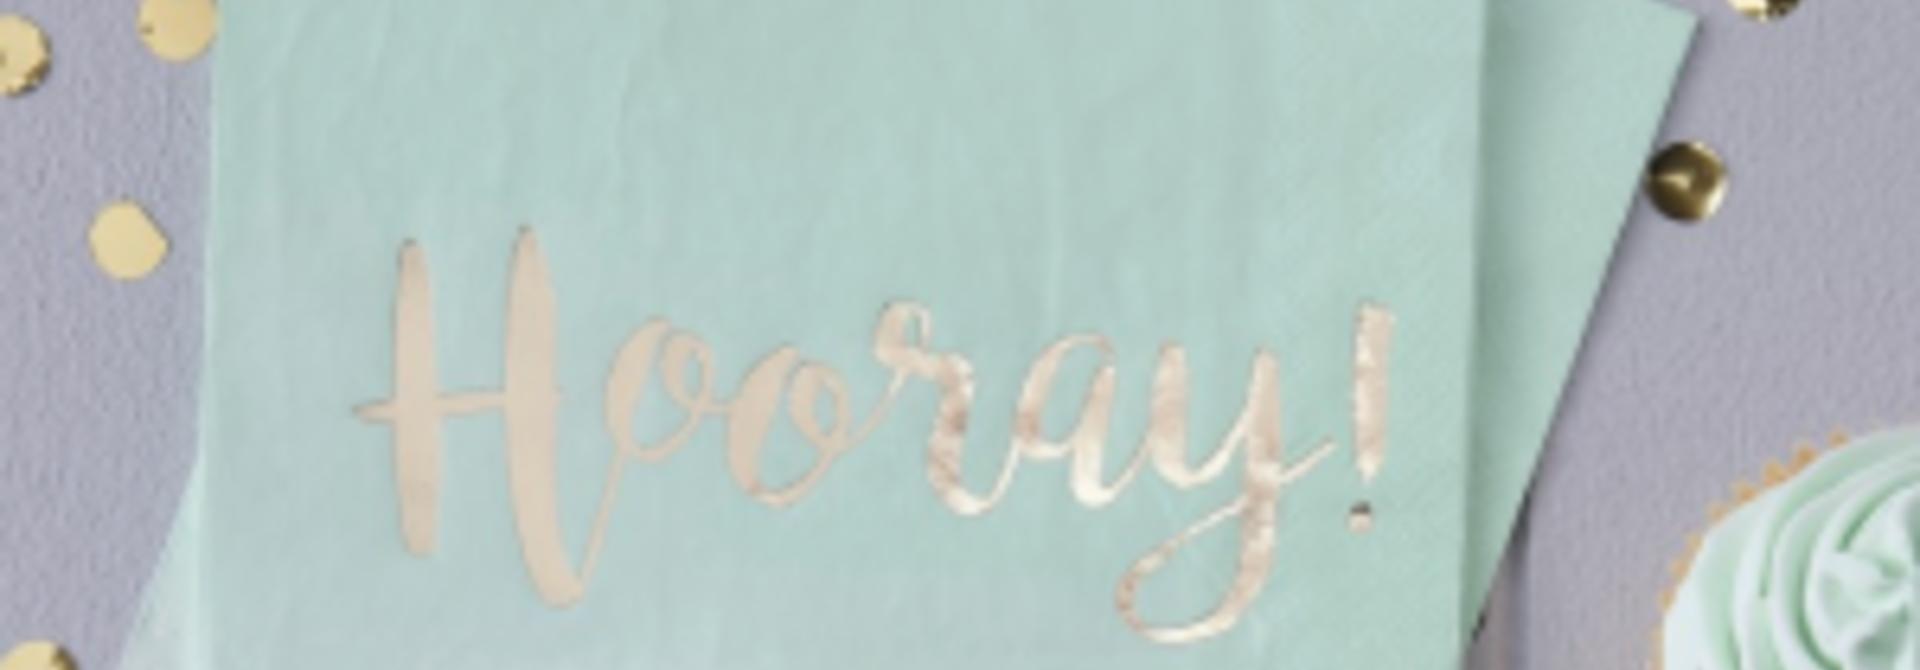 Hooray servetten ombre mint (20st)